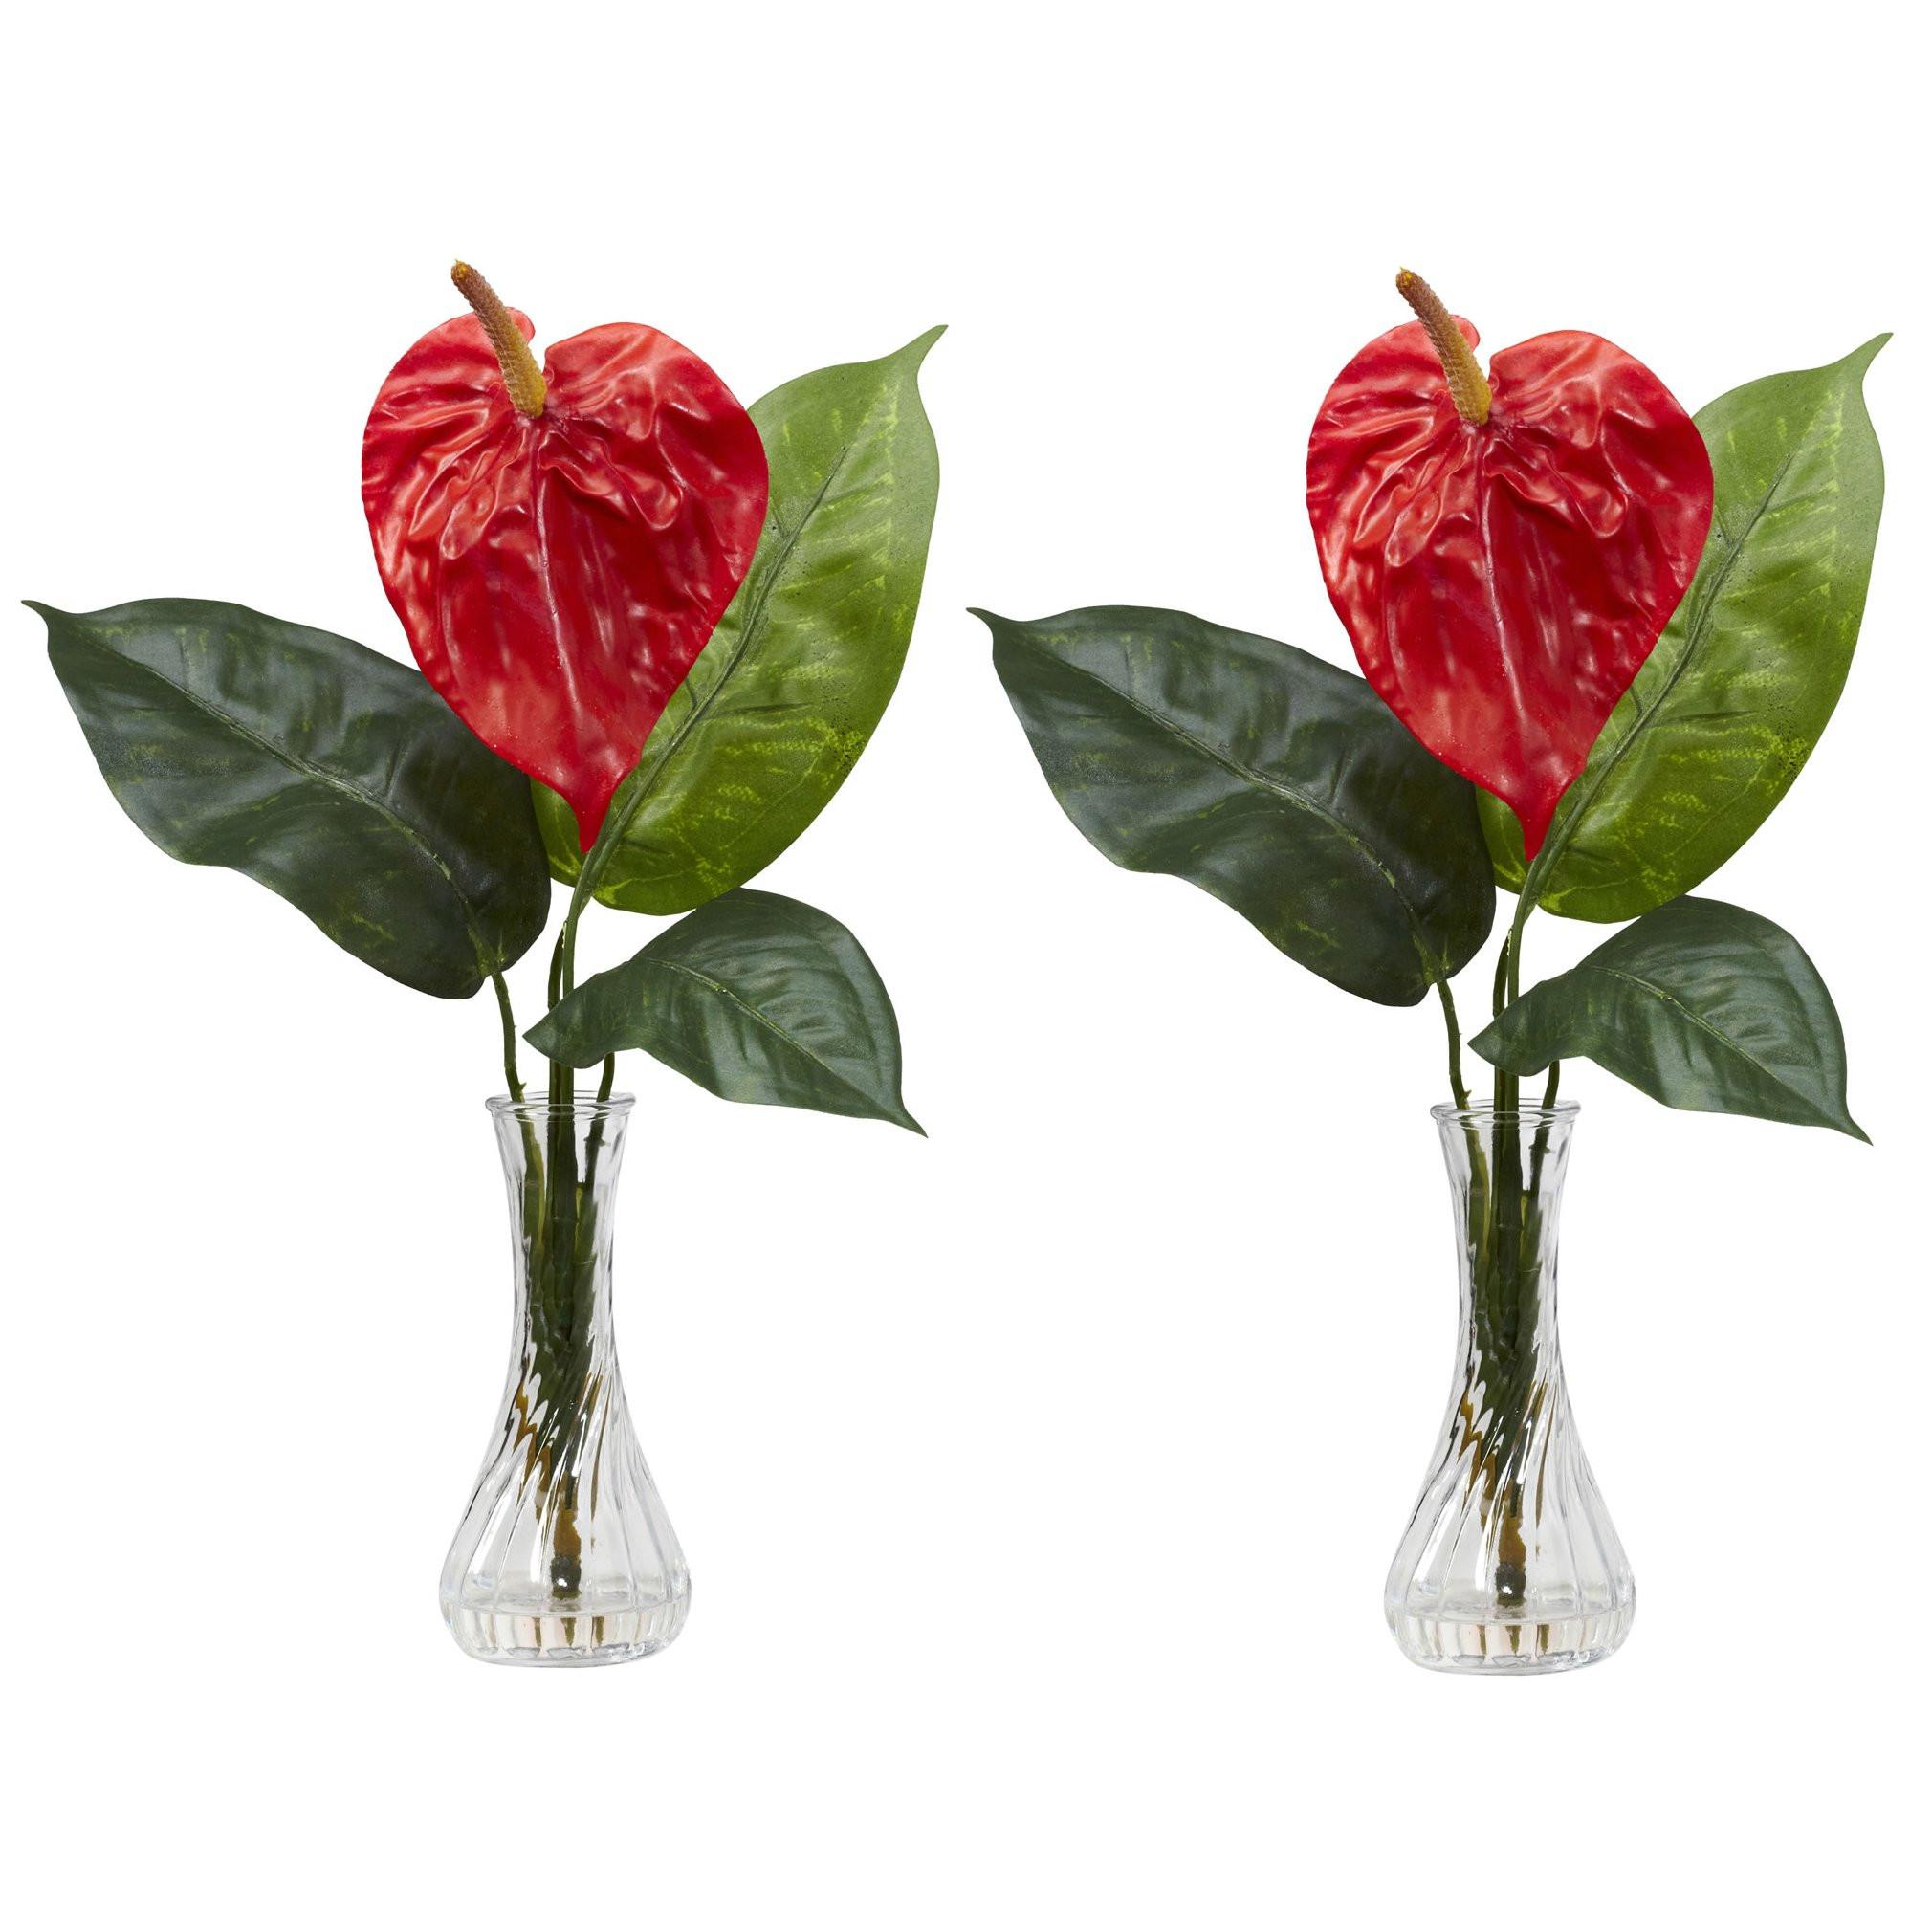 rose gold bud vase of silk flowers for bud vases flowers healthy in anthurium w bud vase set of 2 silk flower arrangement anthurium w bud vase set of 2 silk flower arrangement silk